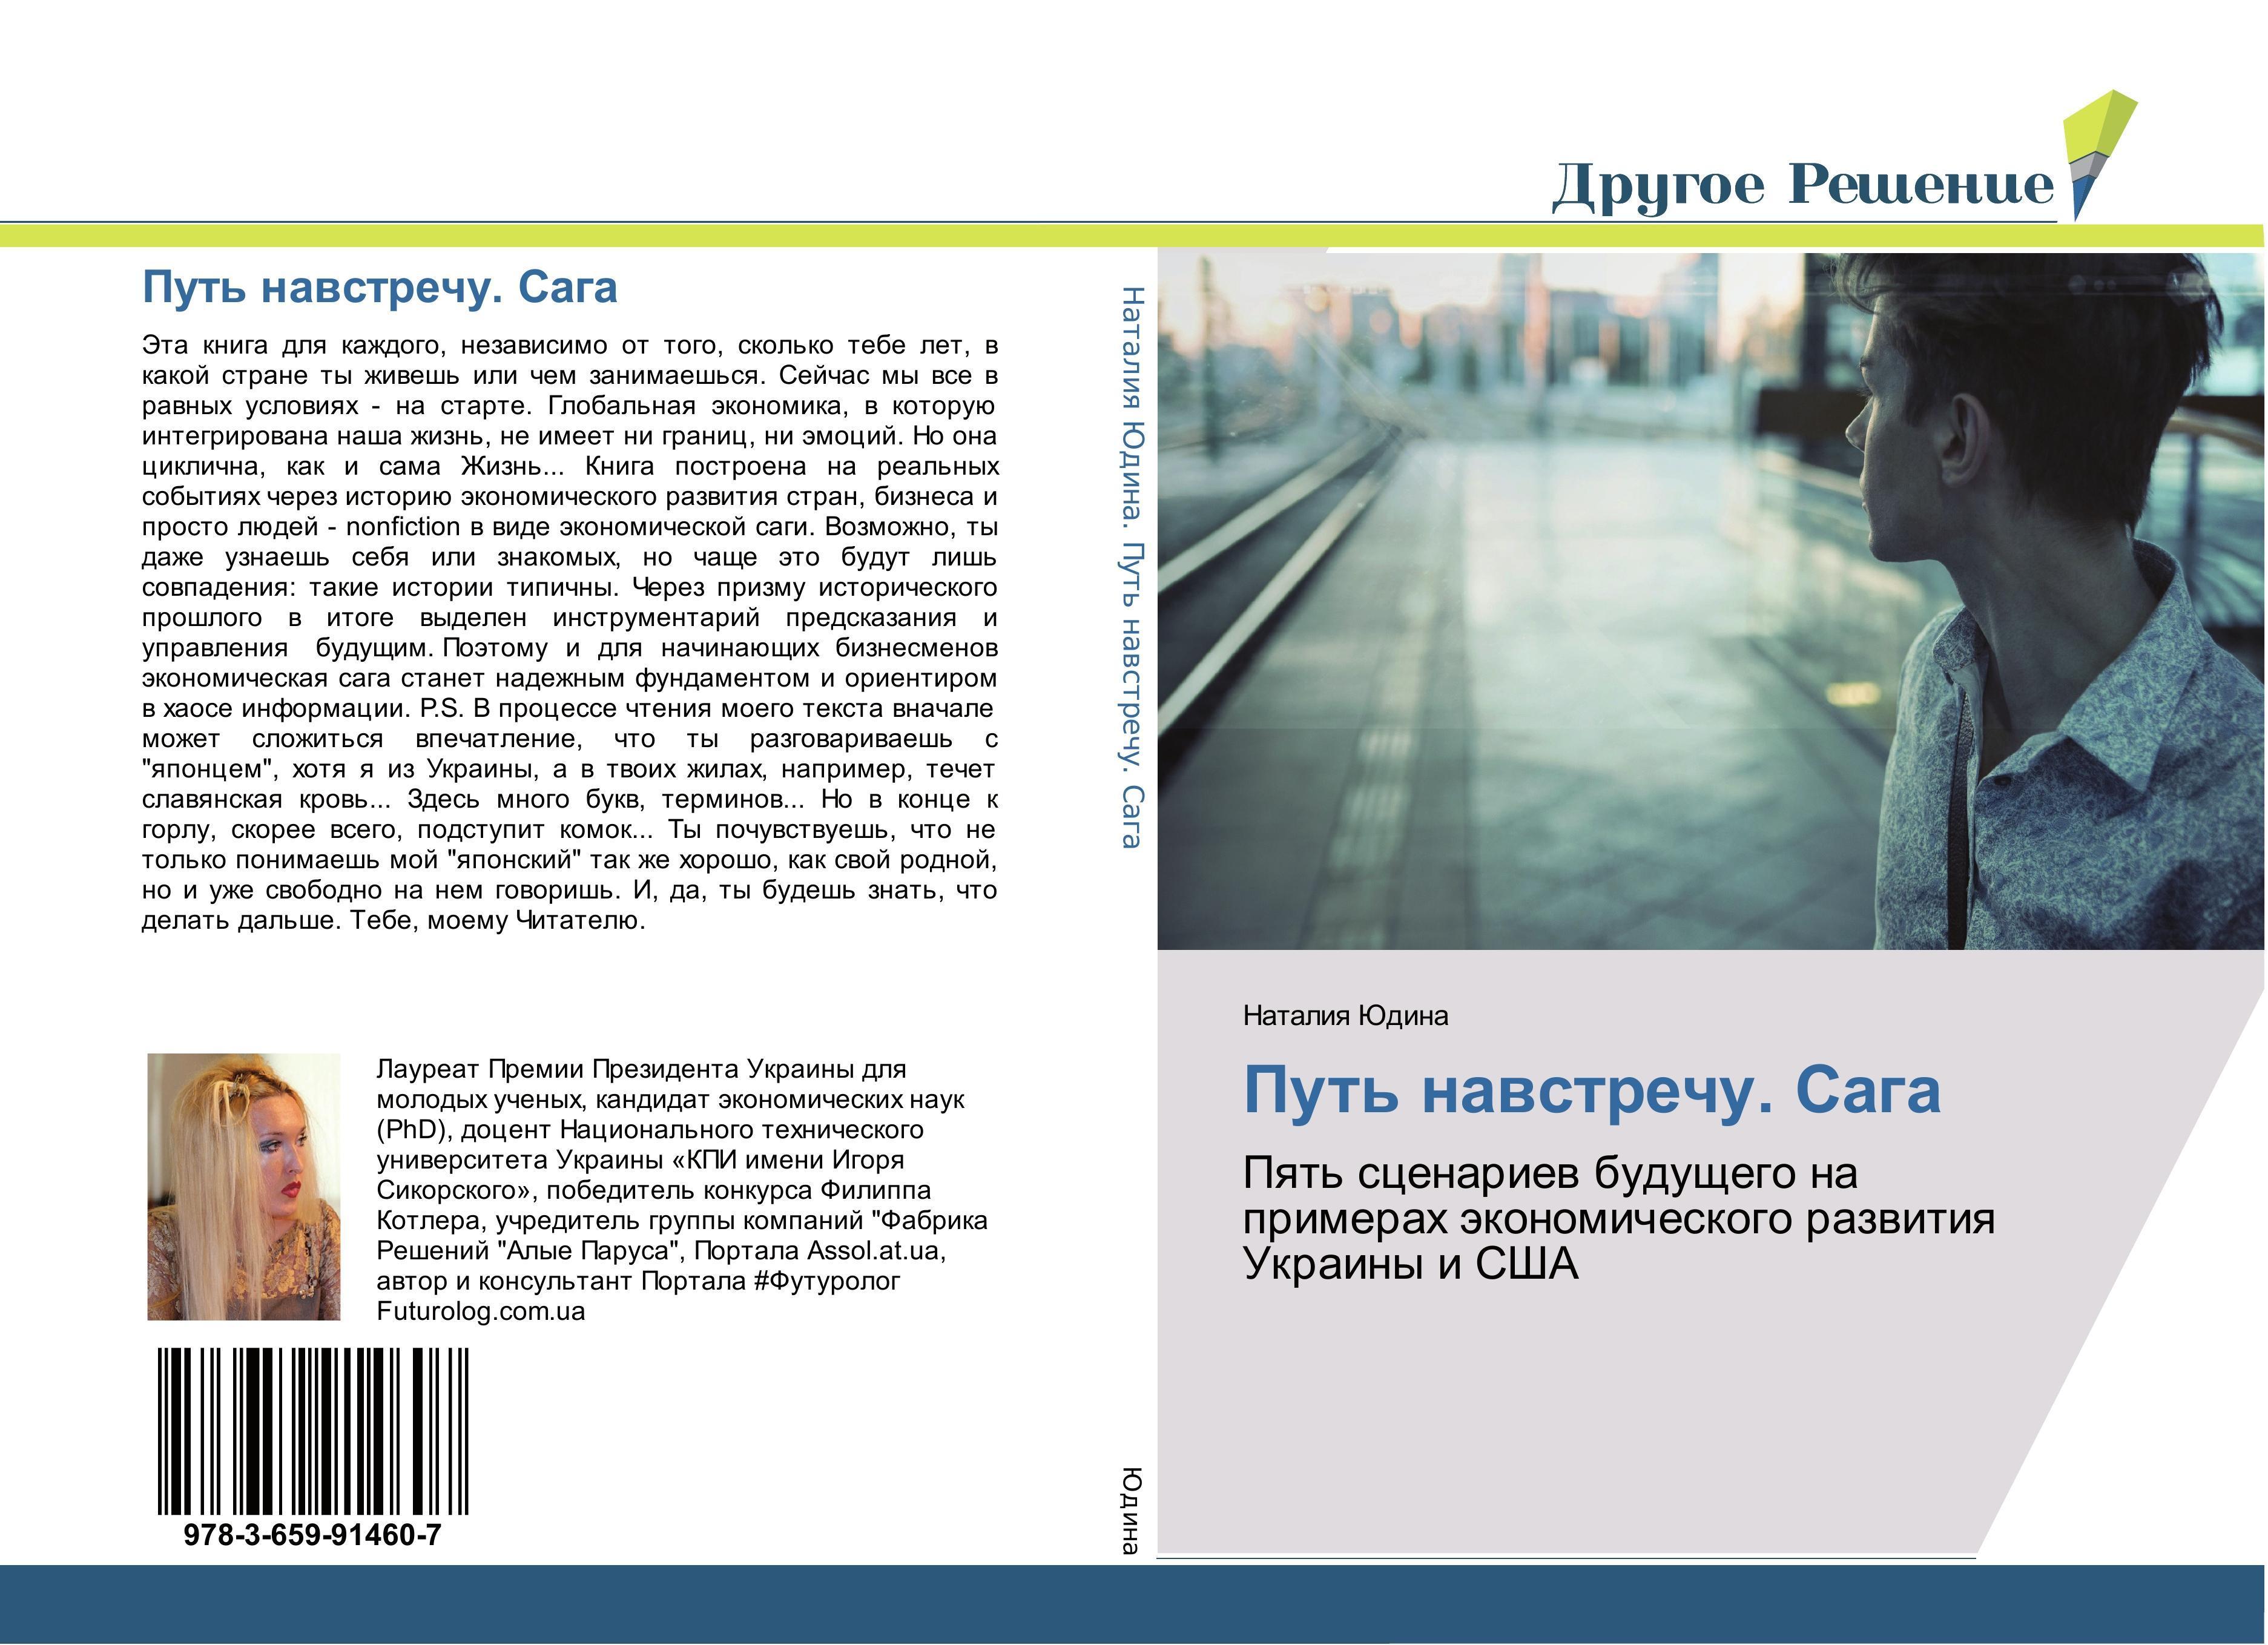 Put-039-navstrechu-Saga-Nataliya-Judina-9783659914607